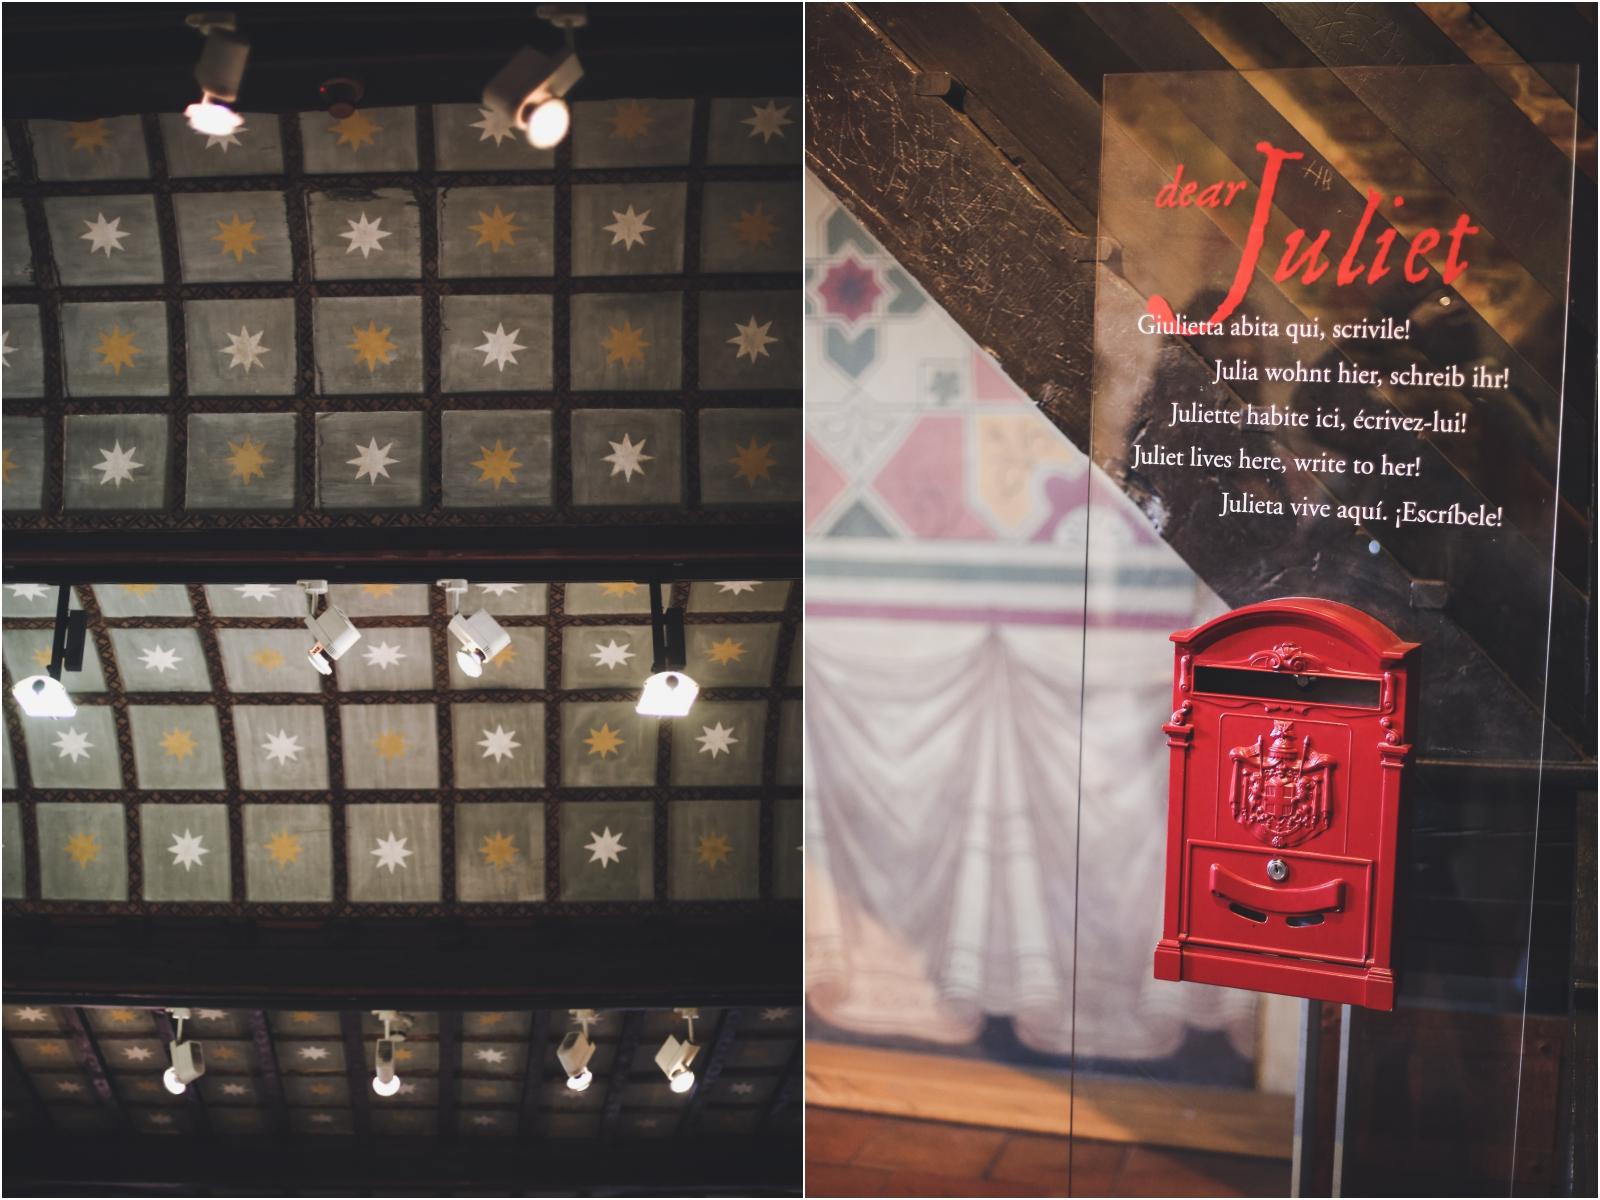 Casa Di Giulietta, la visite de la Maison de Juliette